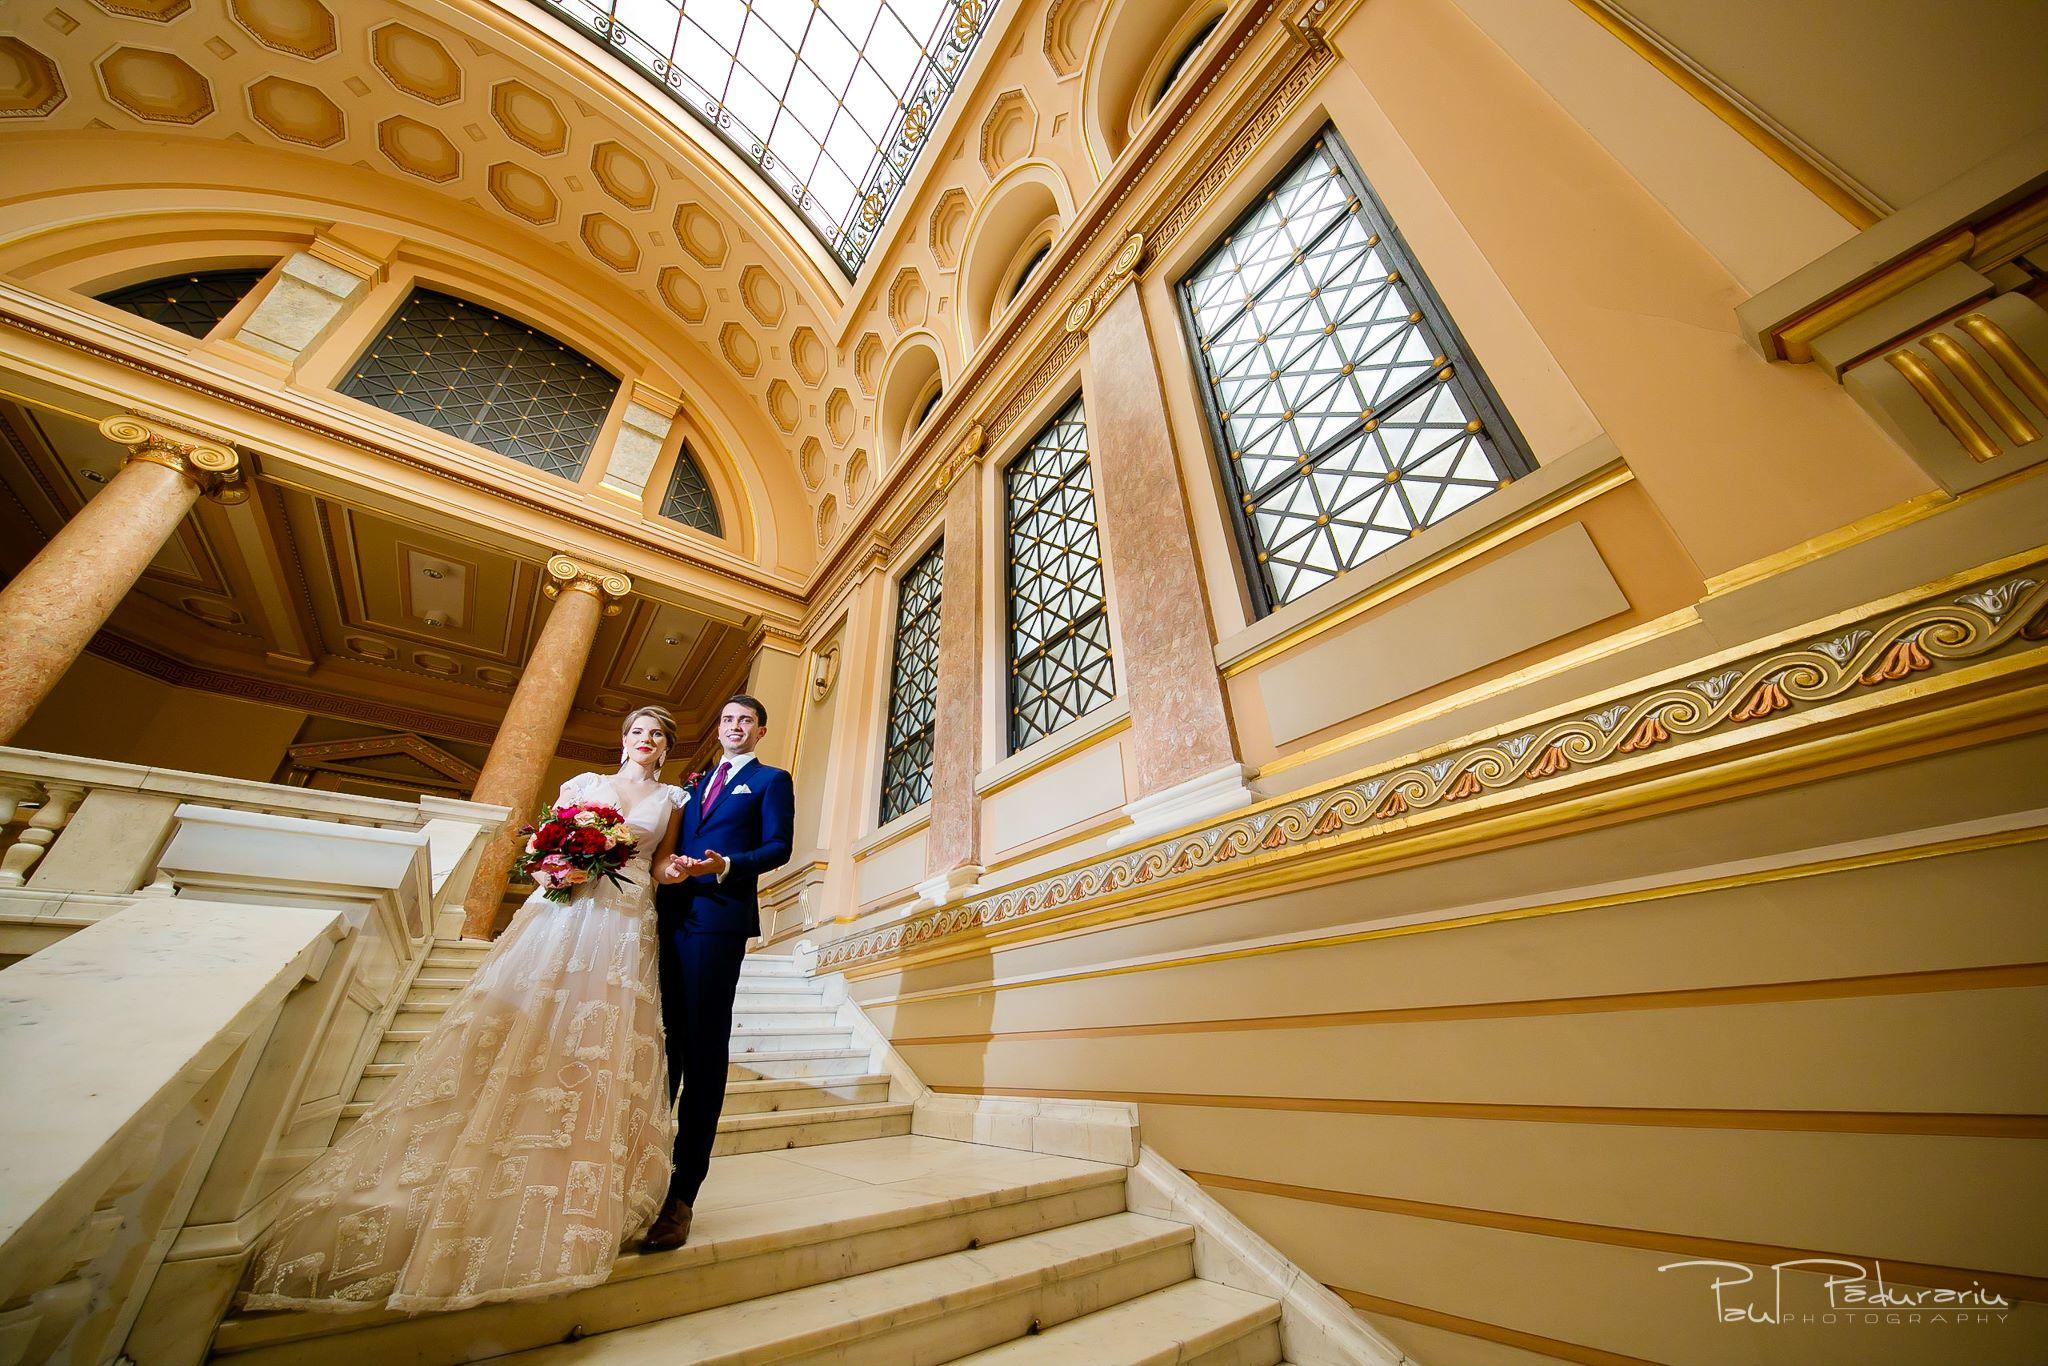 Madalina si Ionut - nunta Congress Hall | fotograf nunta iasi paul padurariu same day edit 2019 9